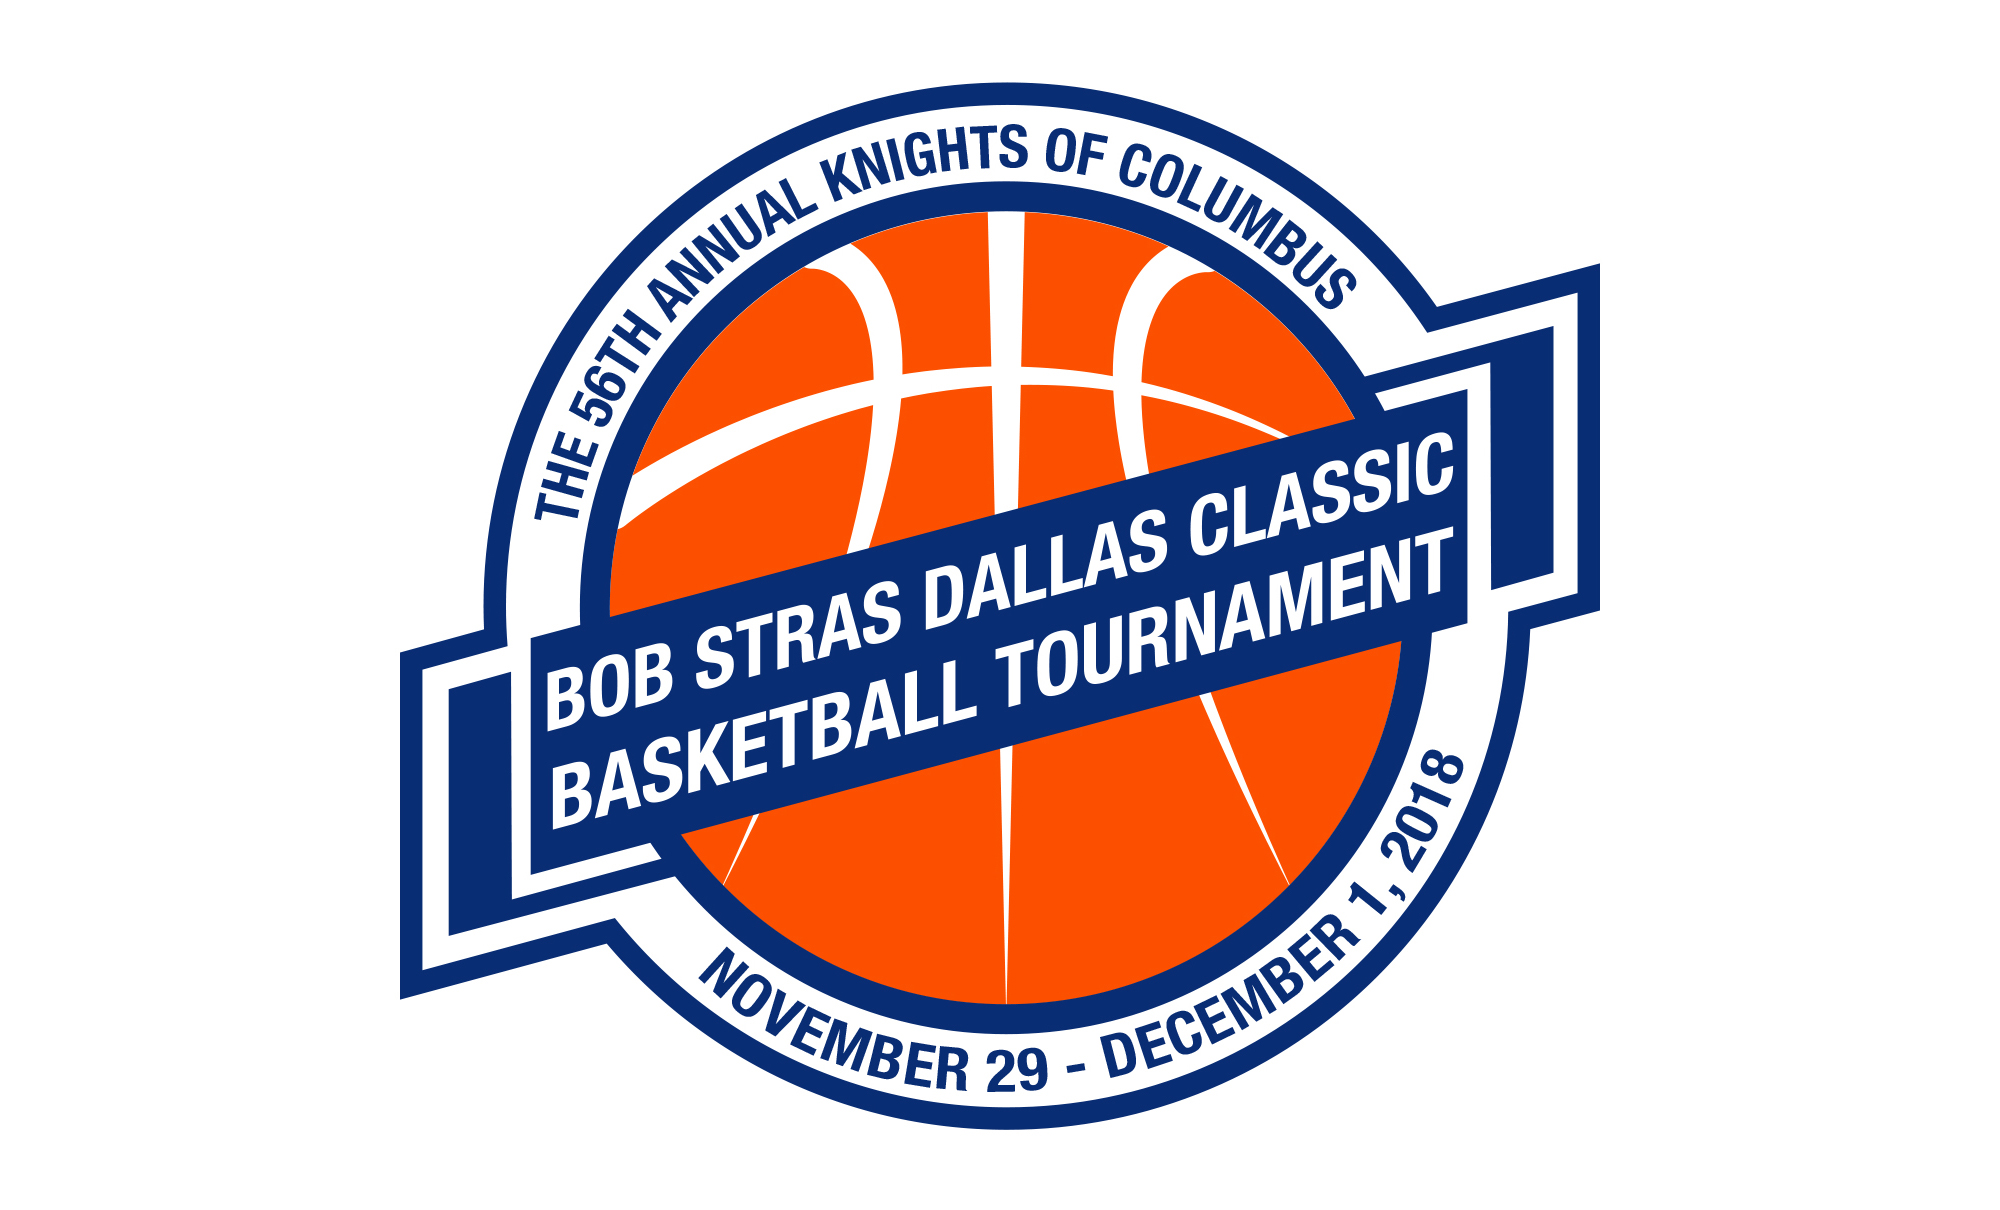 Bob-Stras-2018-Logo-02